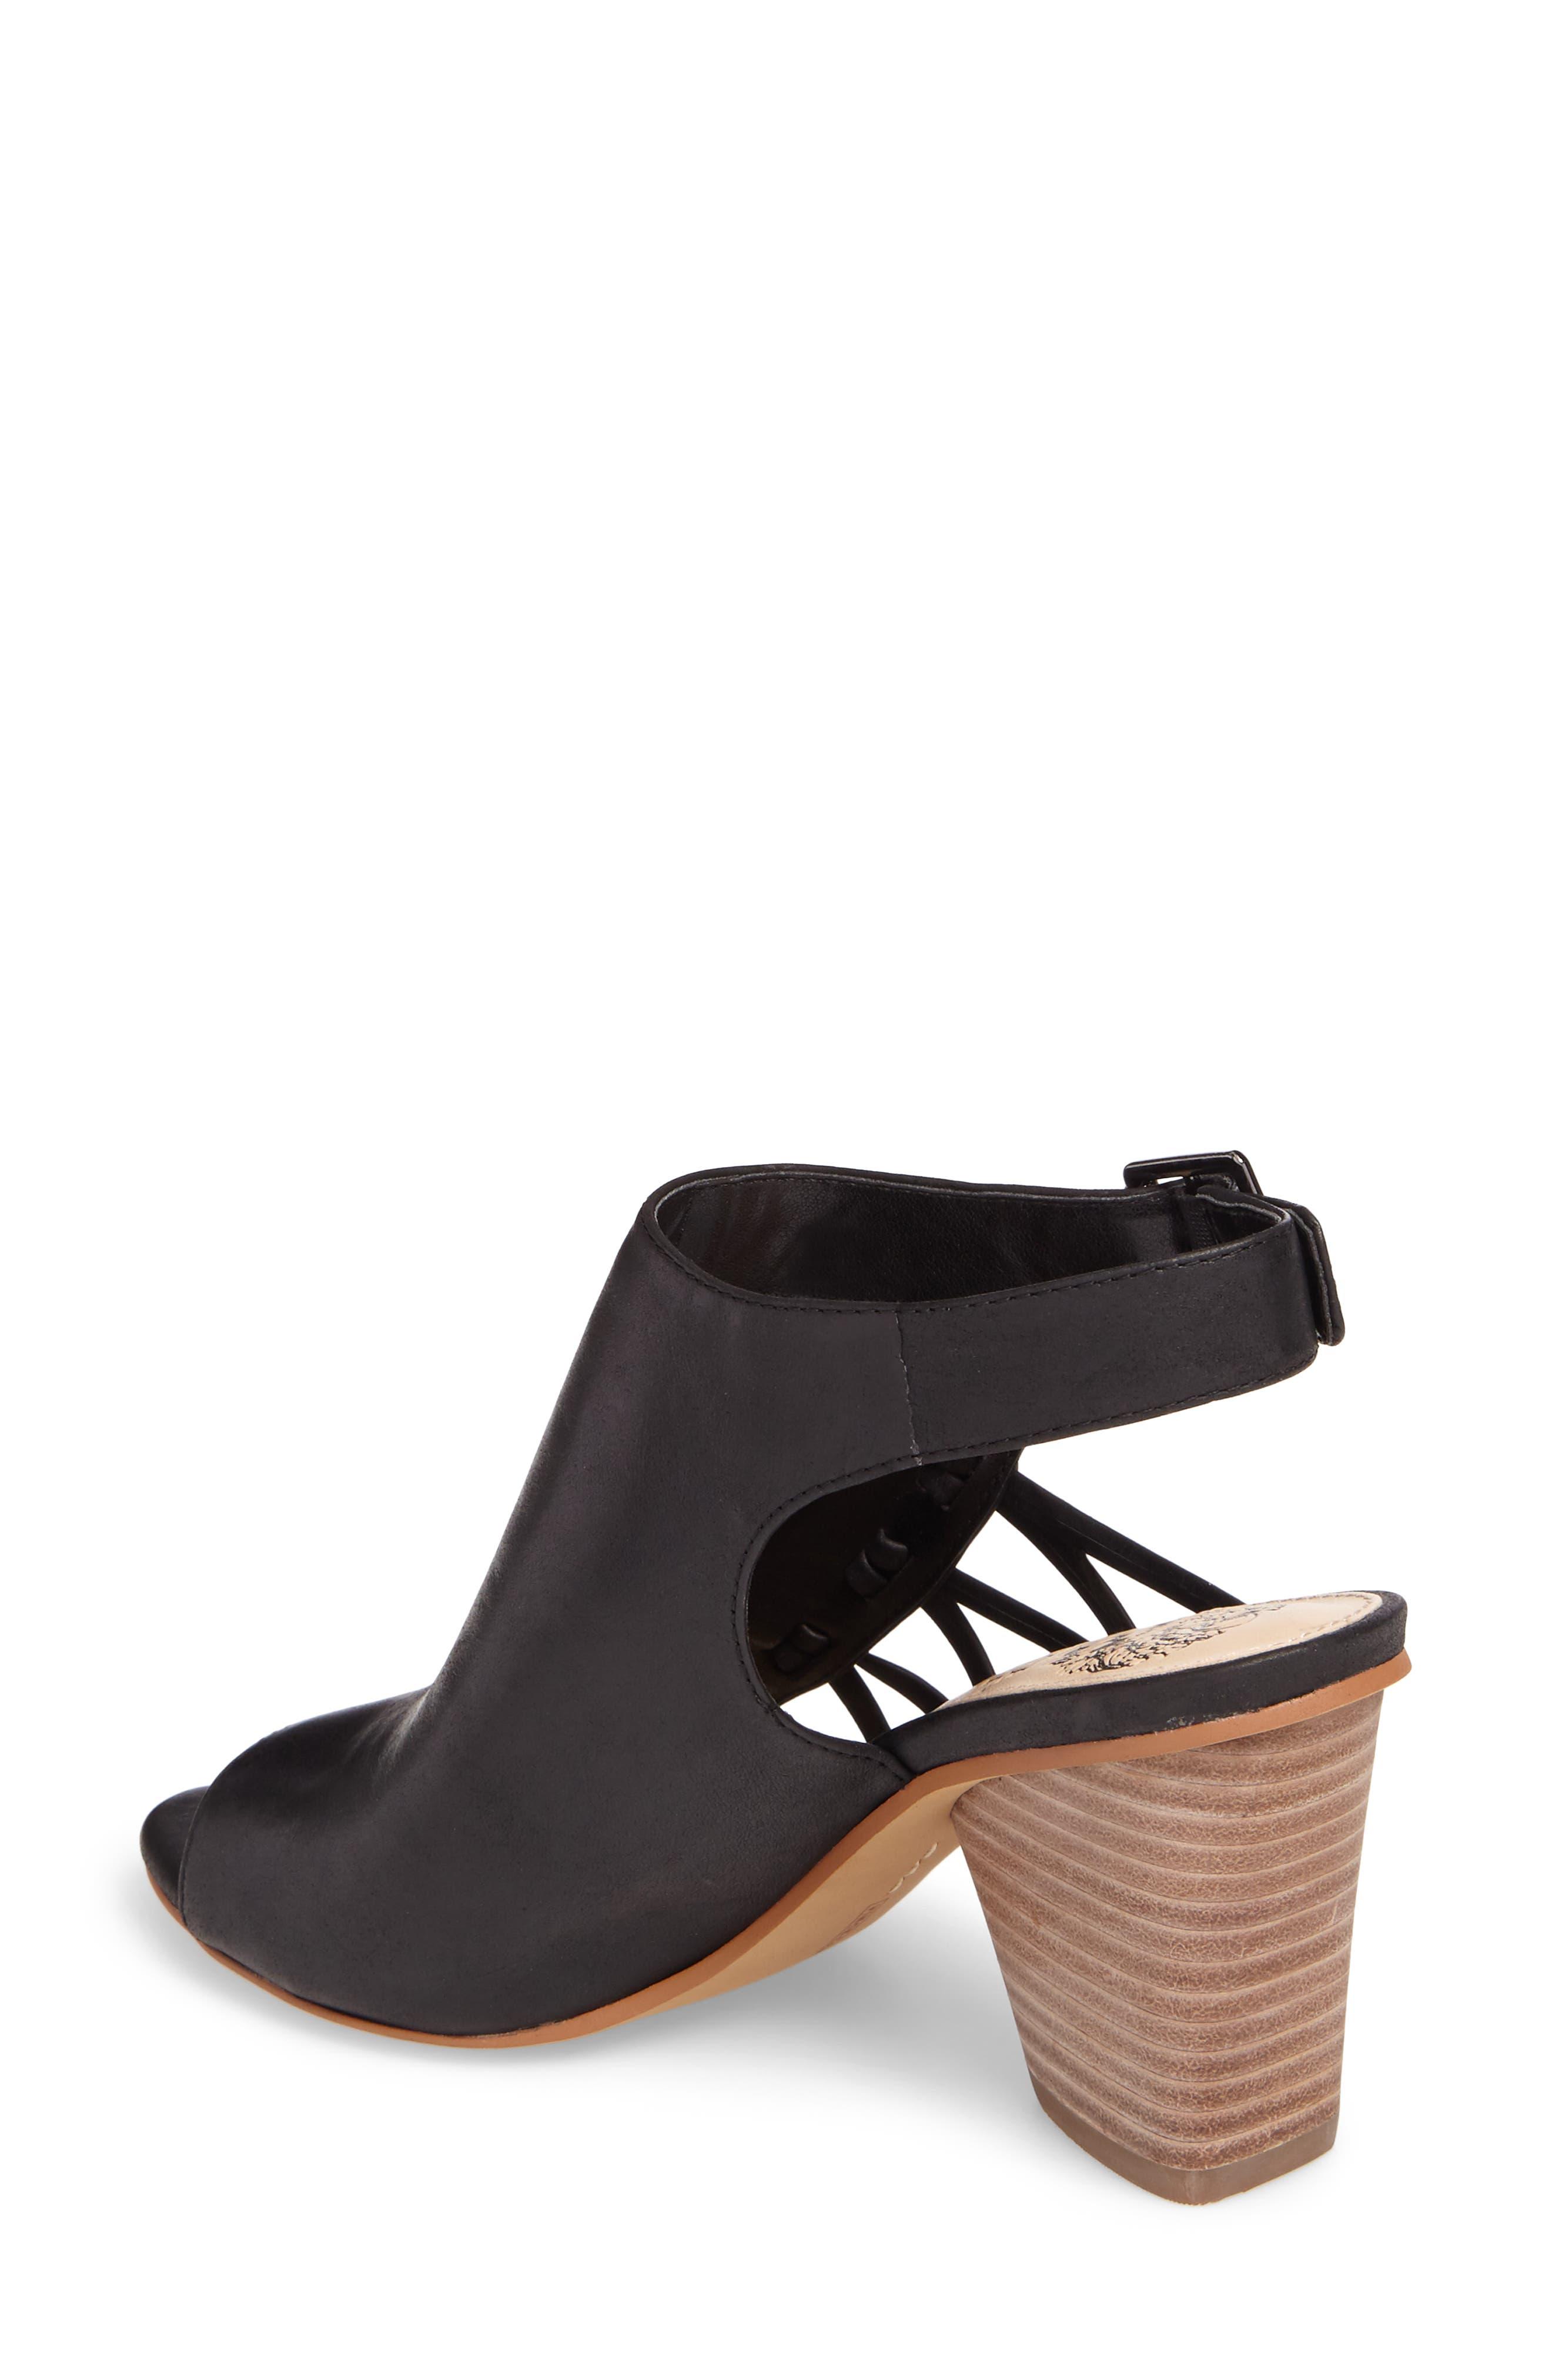 Ankara Sandal,                             Alternate thumbnail 2, color,                             Black Leather